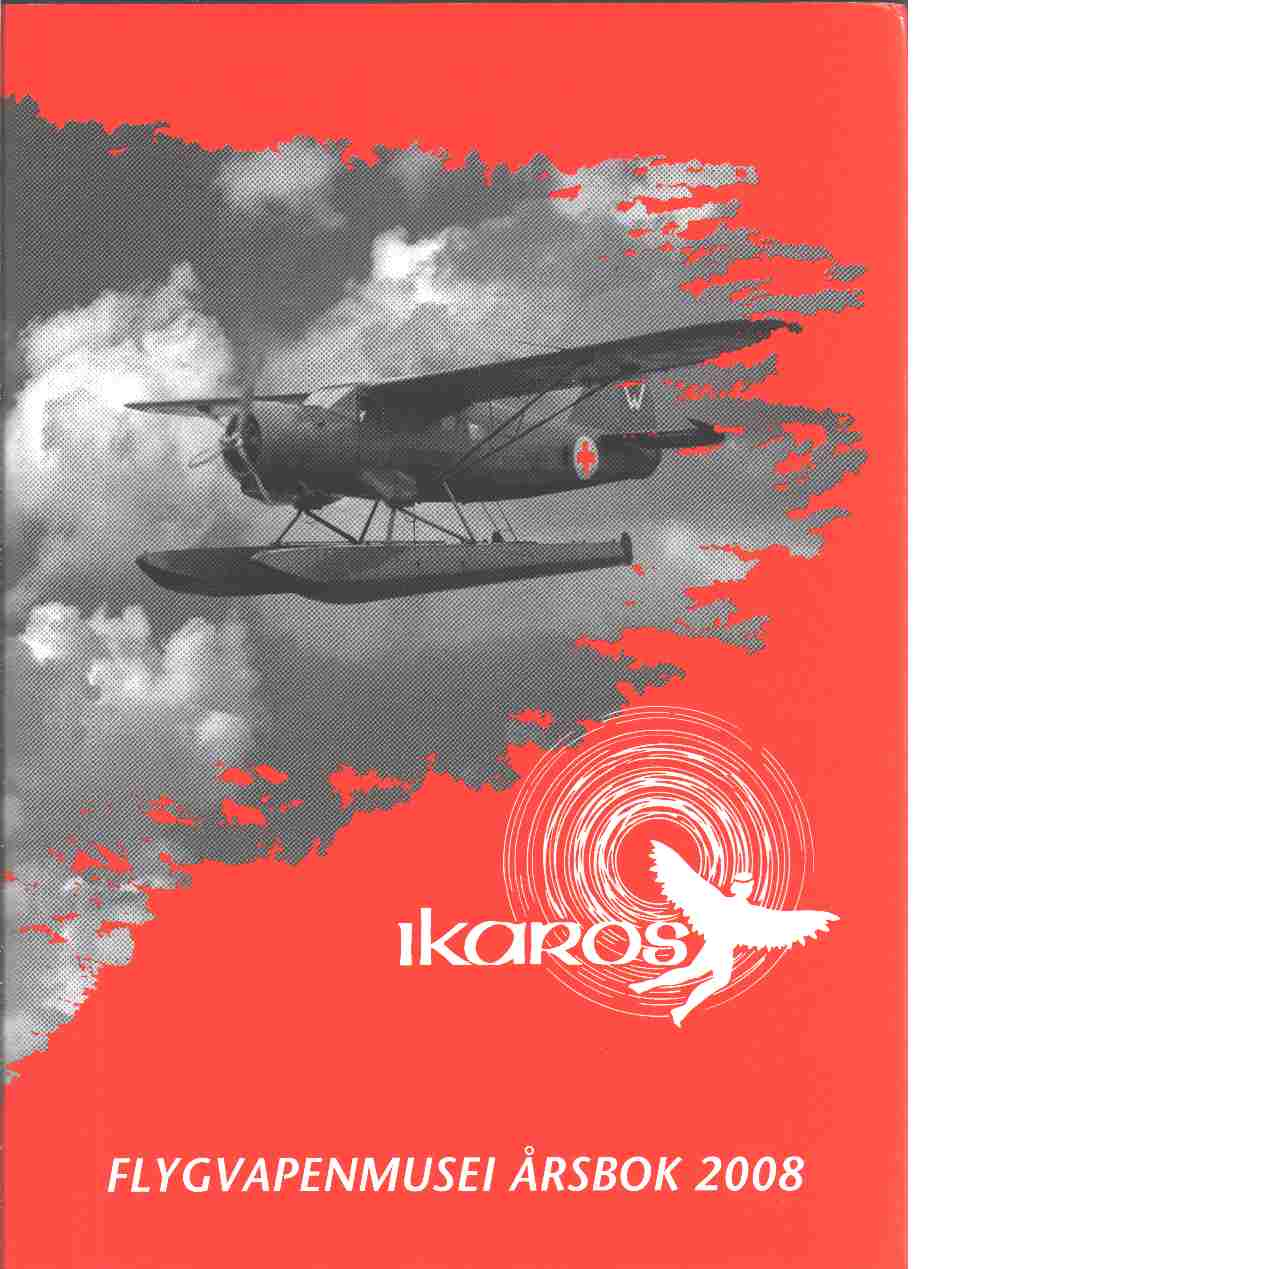 Ikaros : Flygvapenmusei årsbok 2008 - Red. Flygvapenmuseum